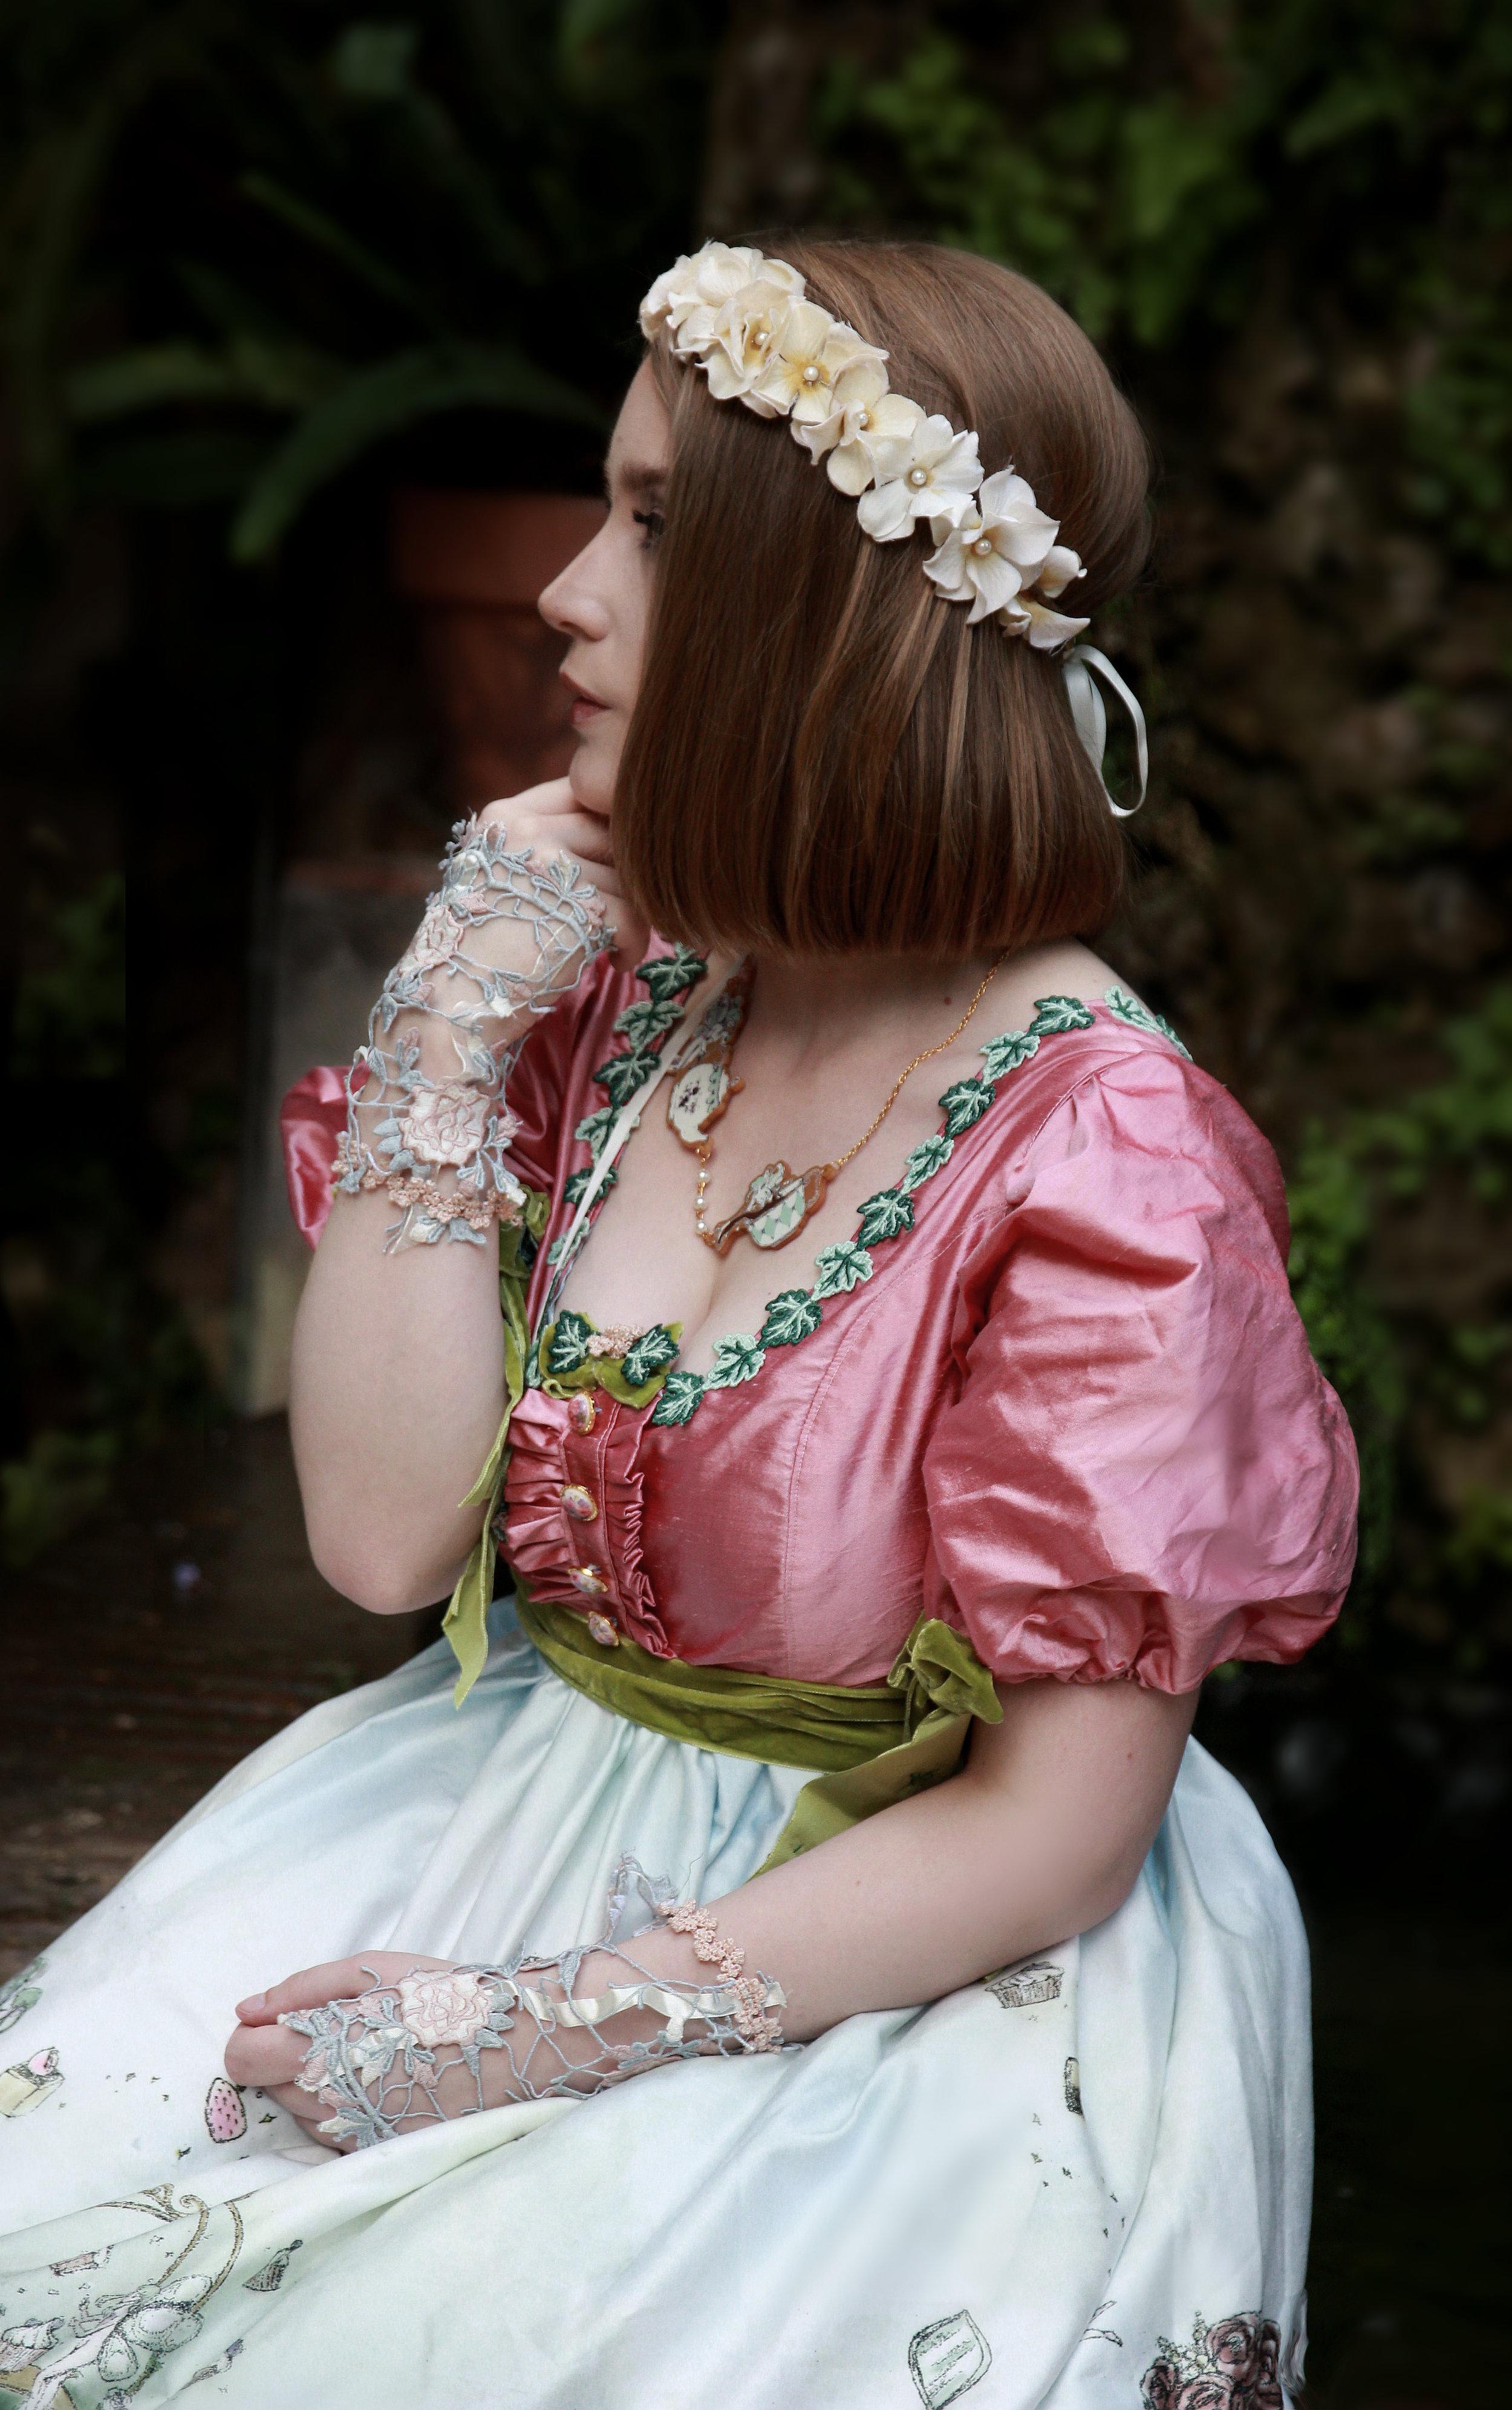 fairyshooting01.jpg